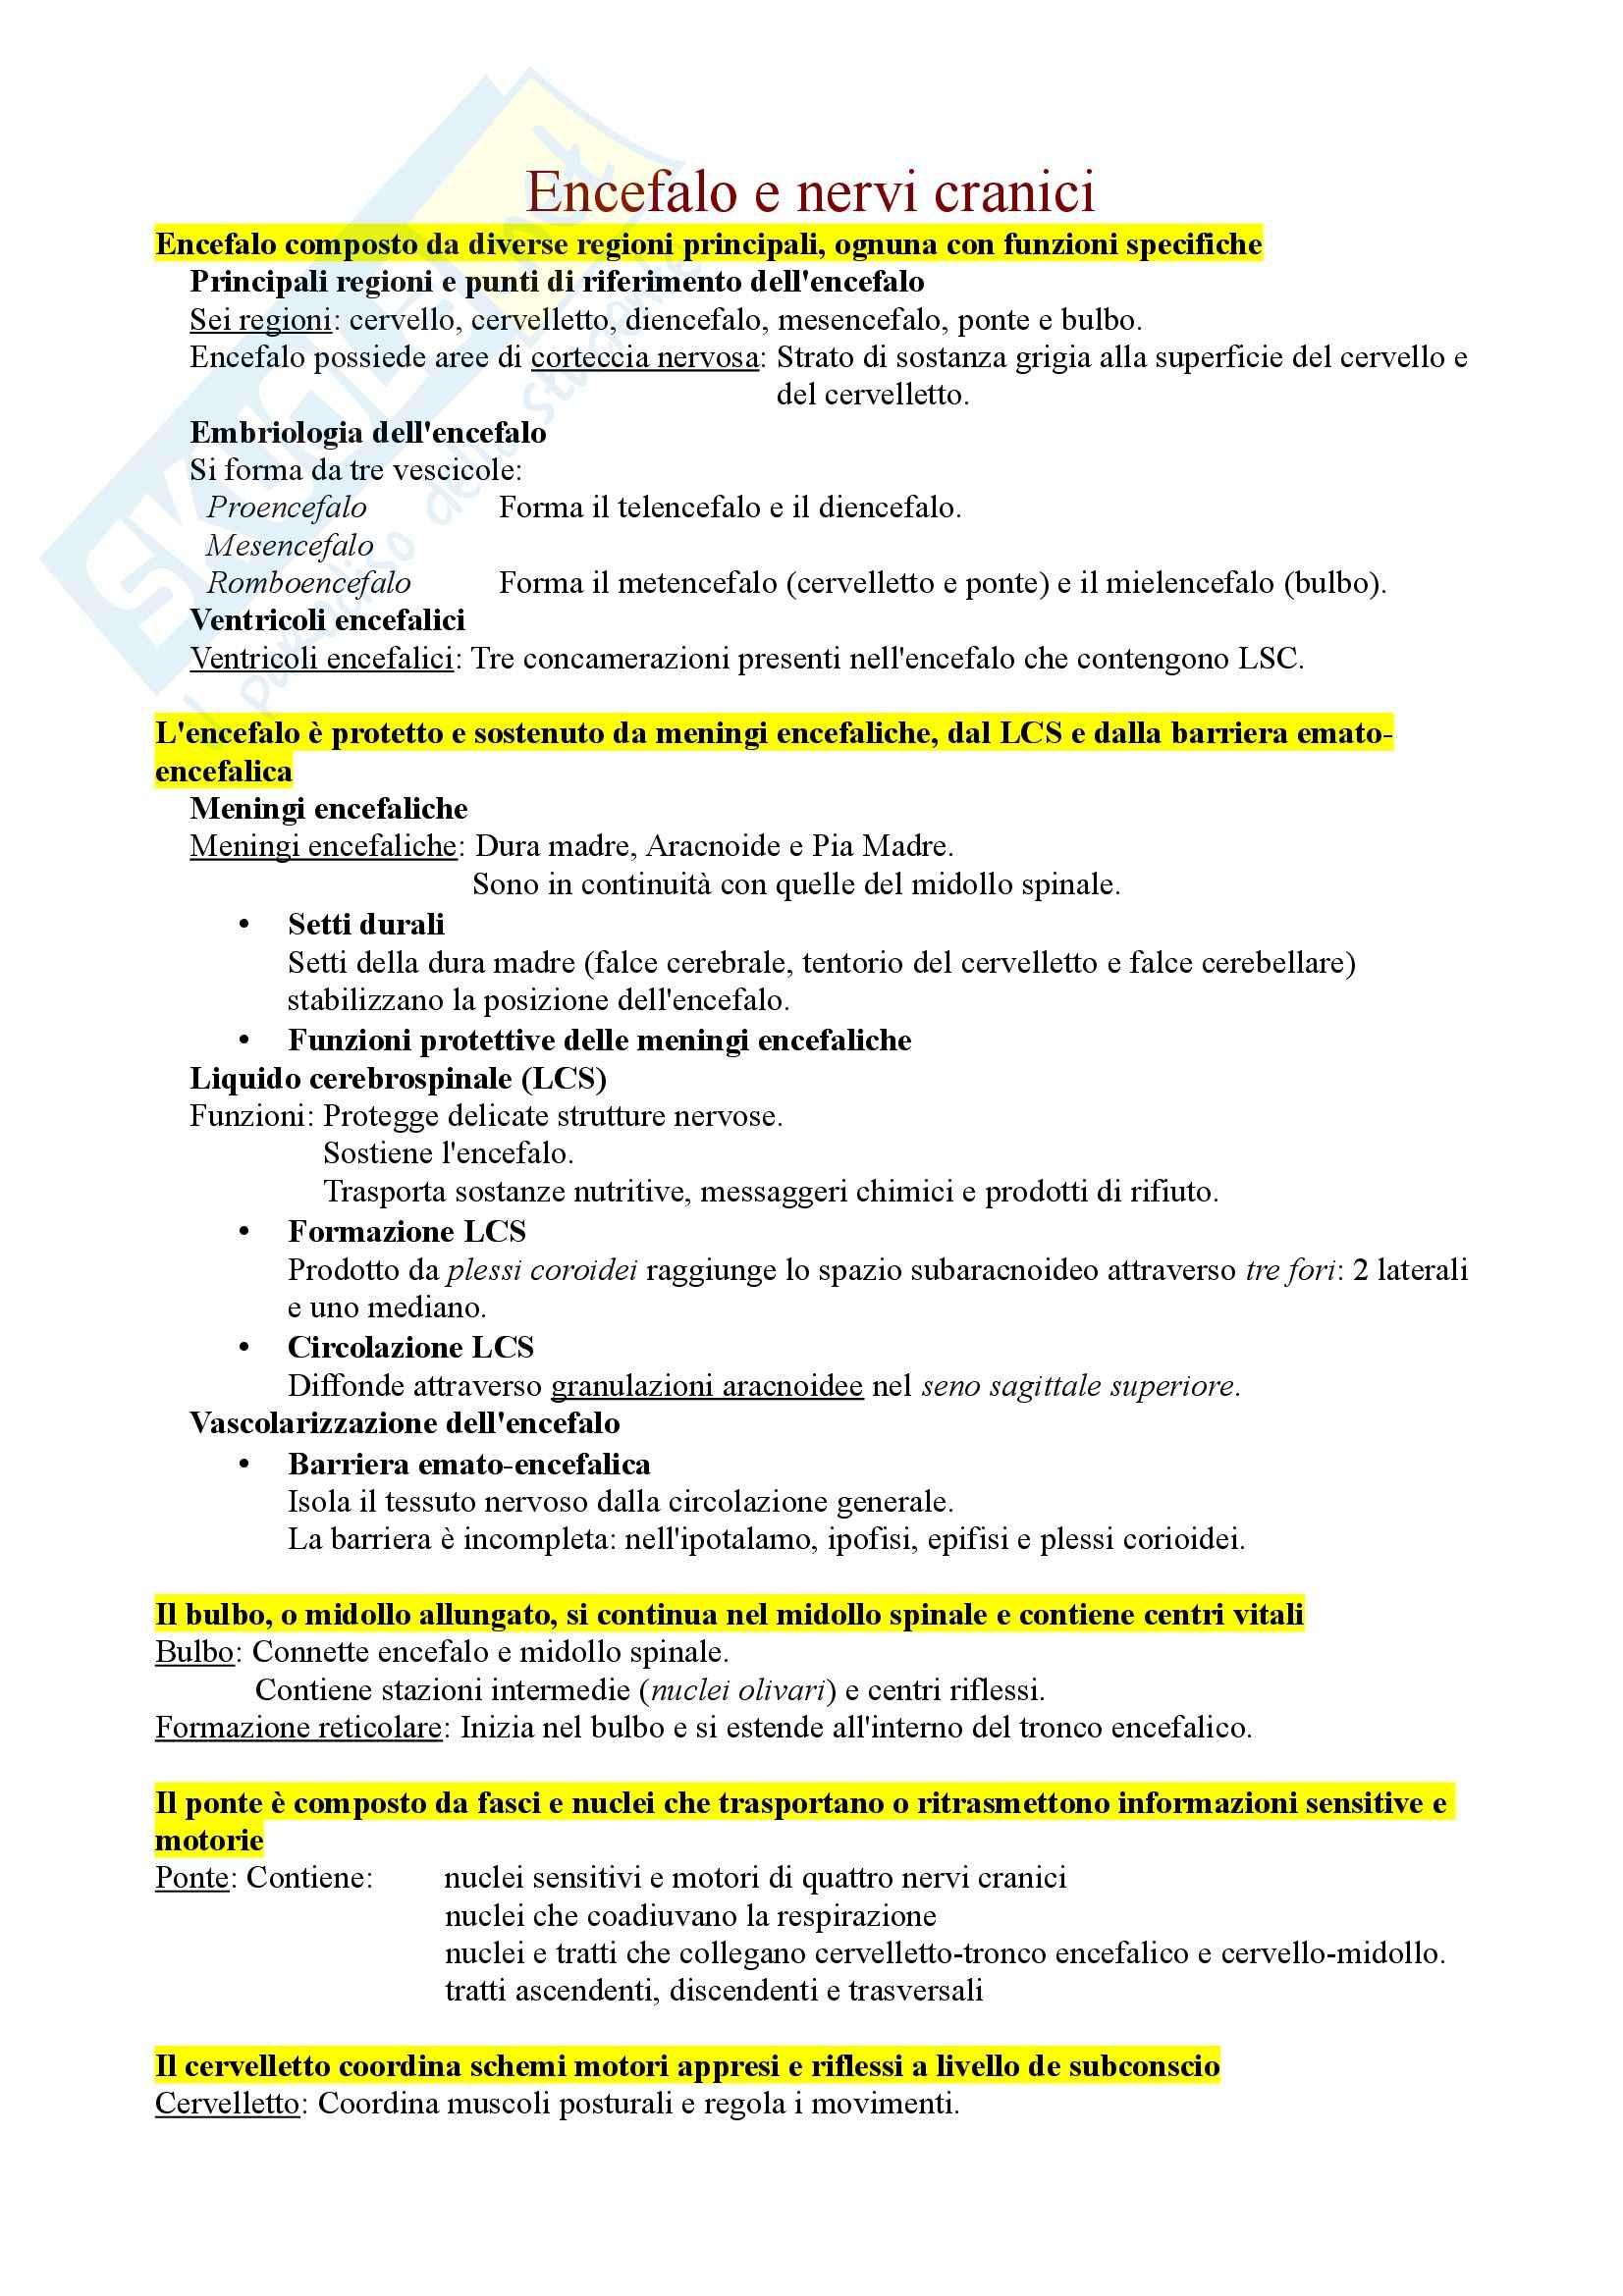 Anatomia - Encefalo e nervi cranici